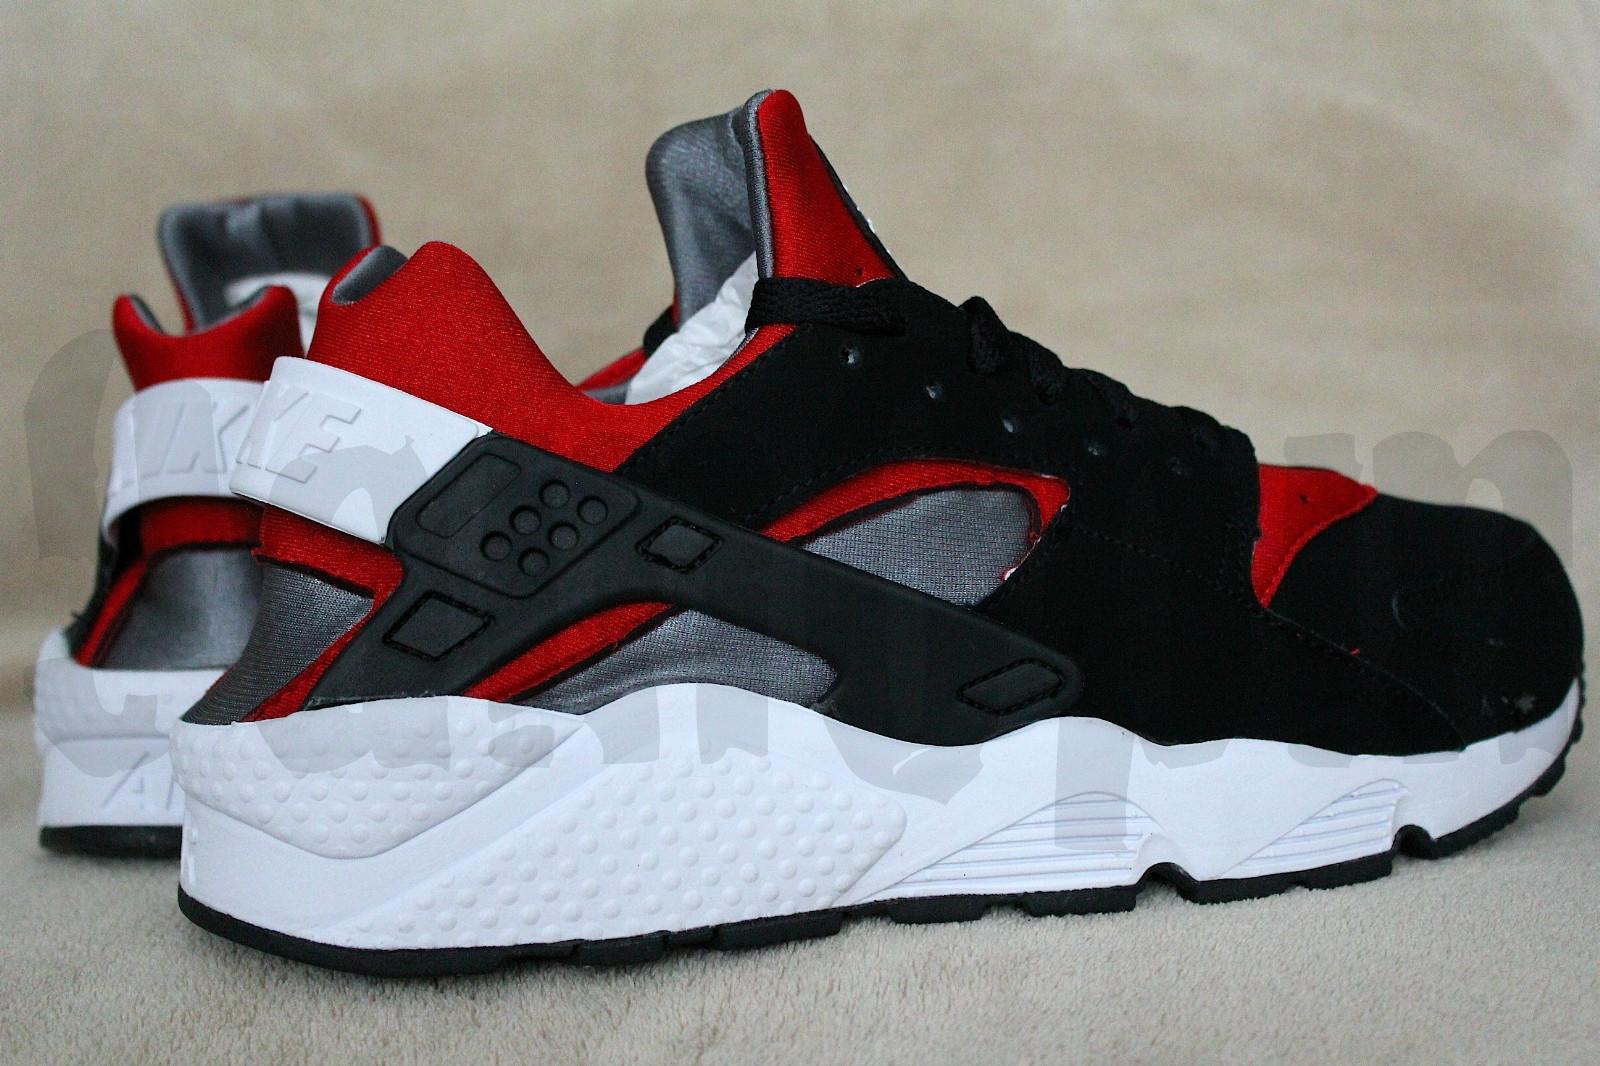 Nike Huarache De Aire Deportivo Negro Rojo nueva línea c6wk0